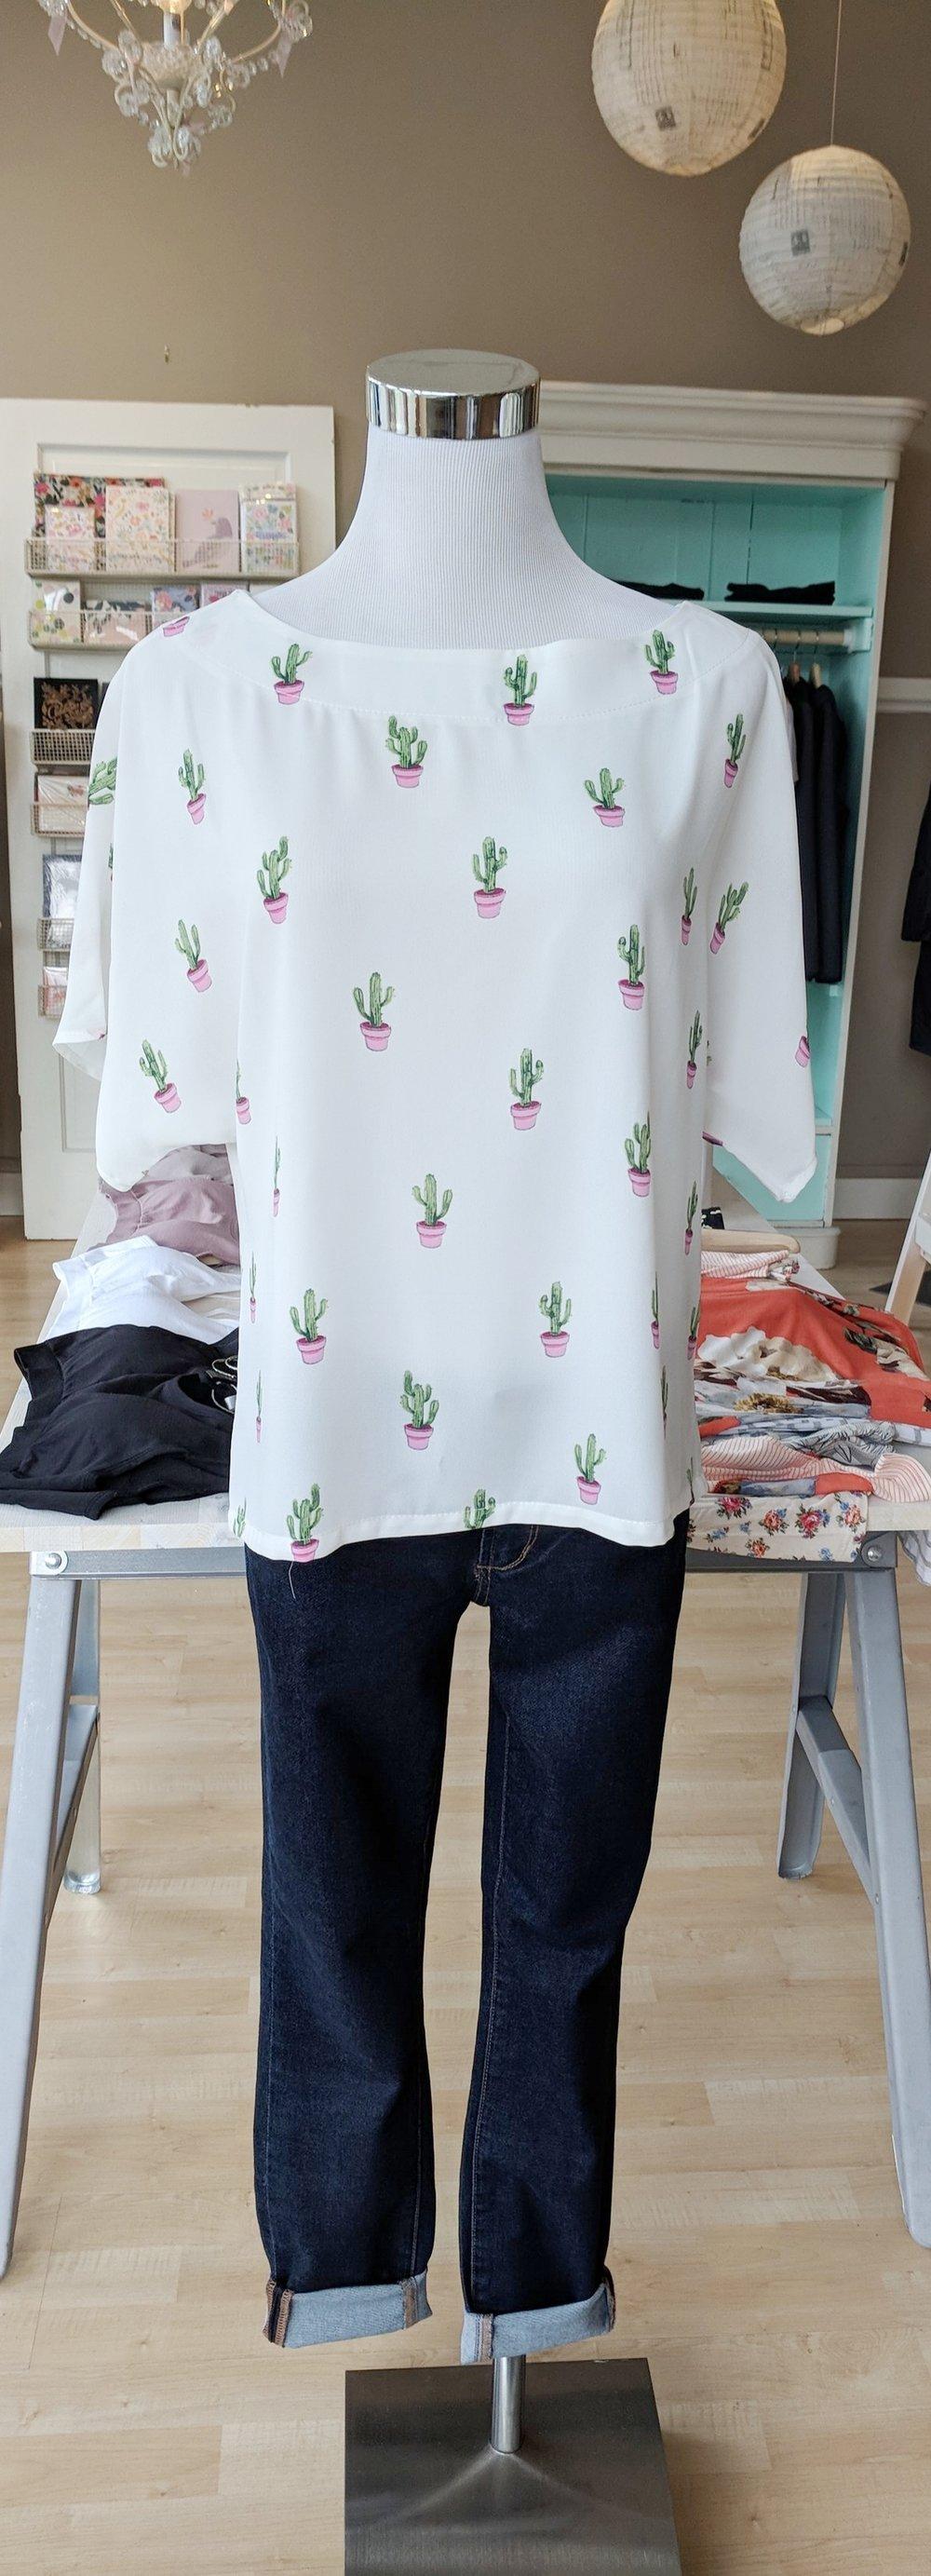 Cactus print top $35